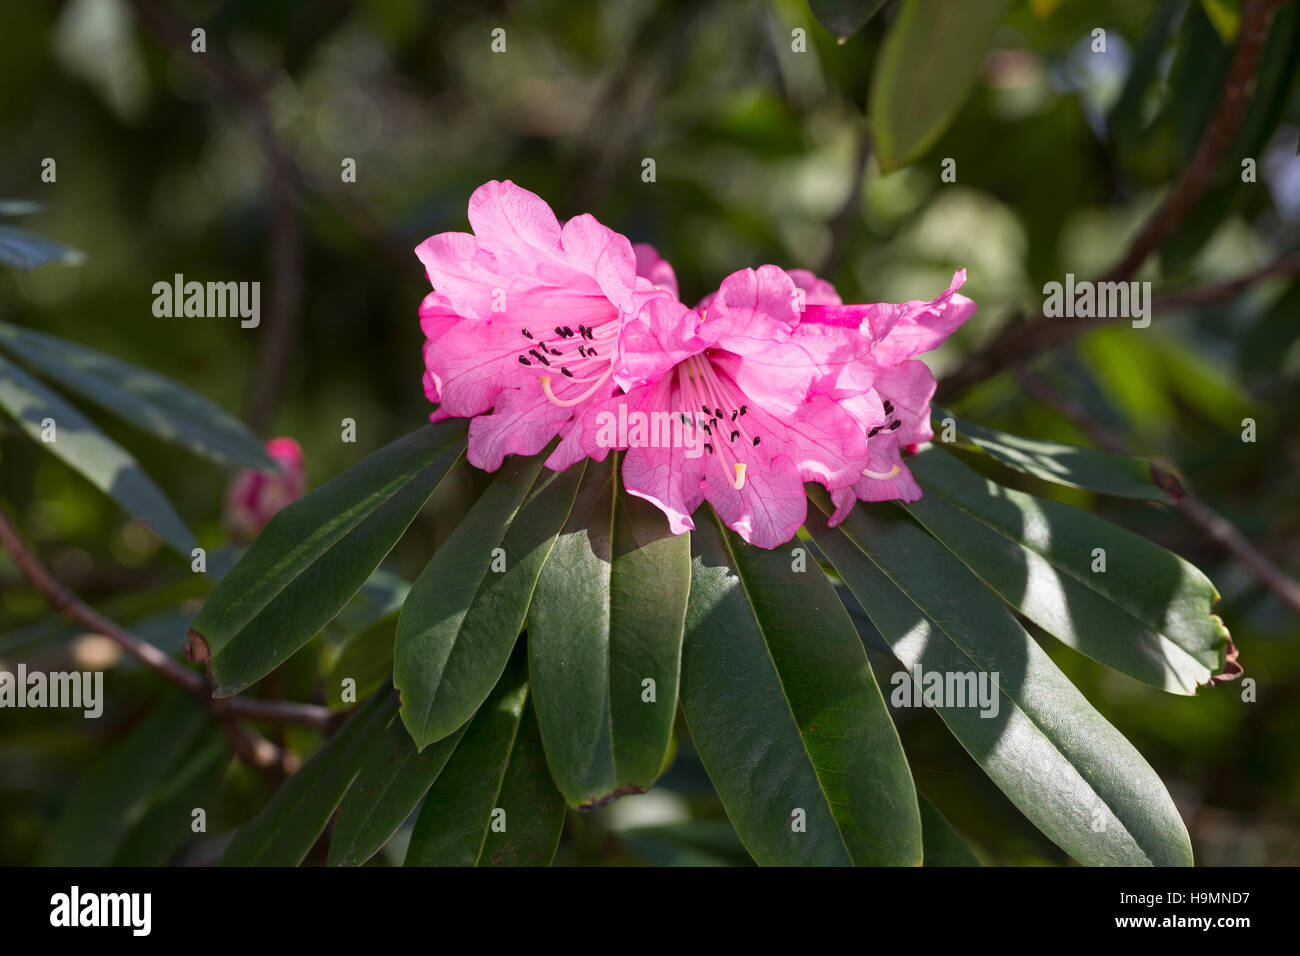 Rhododendron Wildart, Rhododendron anthosphaerum - Stock Image